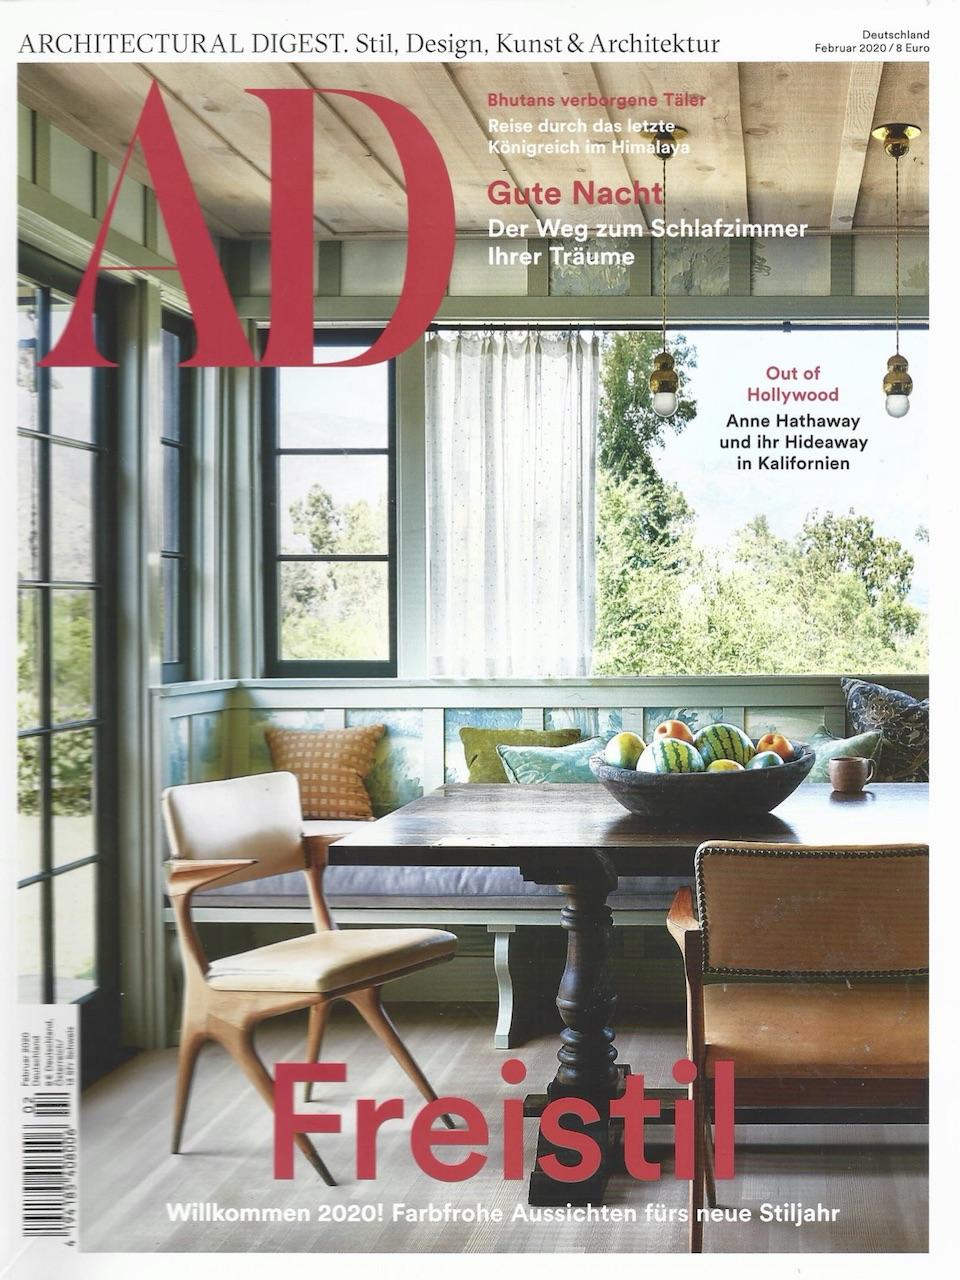 Architectural Digest Februar 1